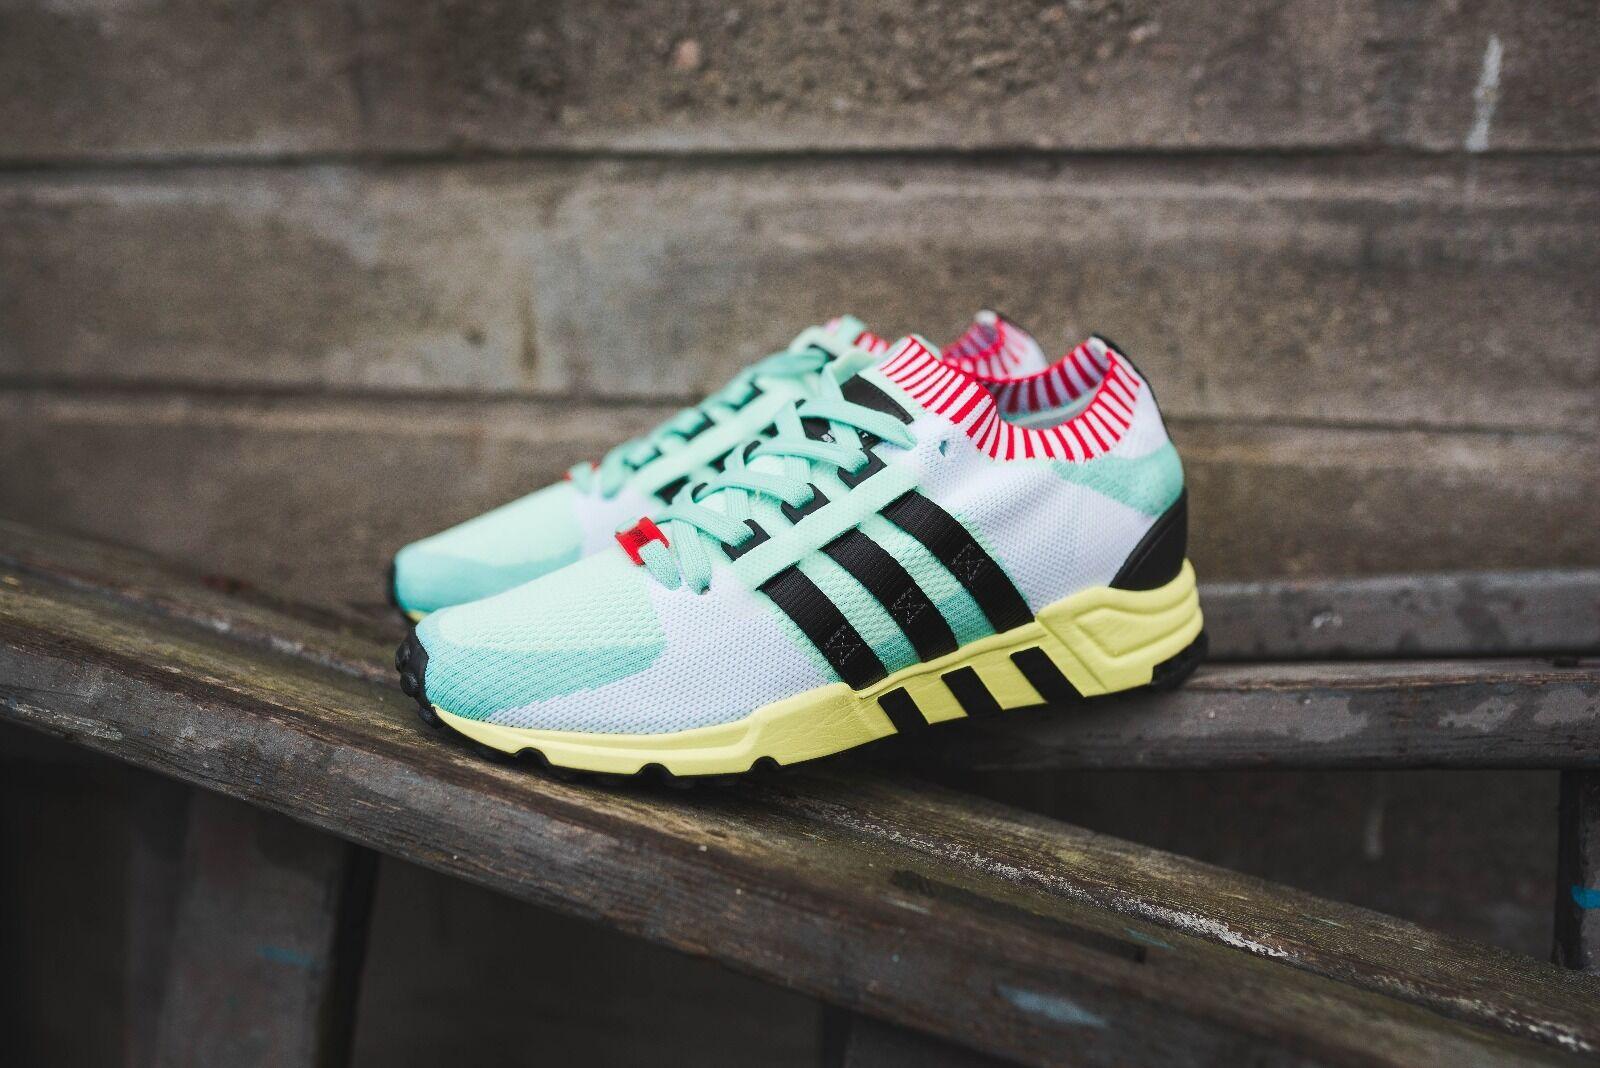 Adidas Originals EQT Support RF Primeknit Sneakers BNWT US 12 *AUSSIE SELLER*